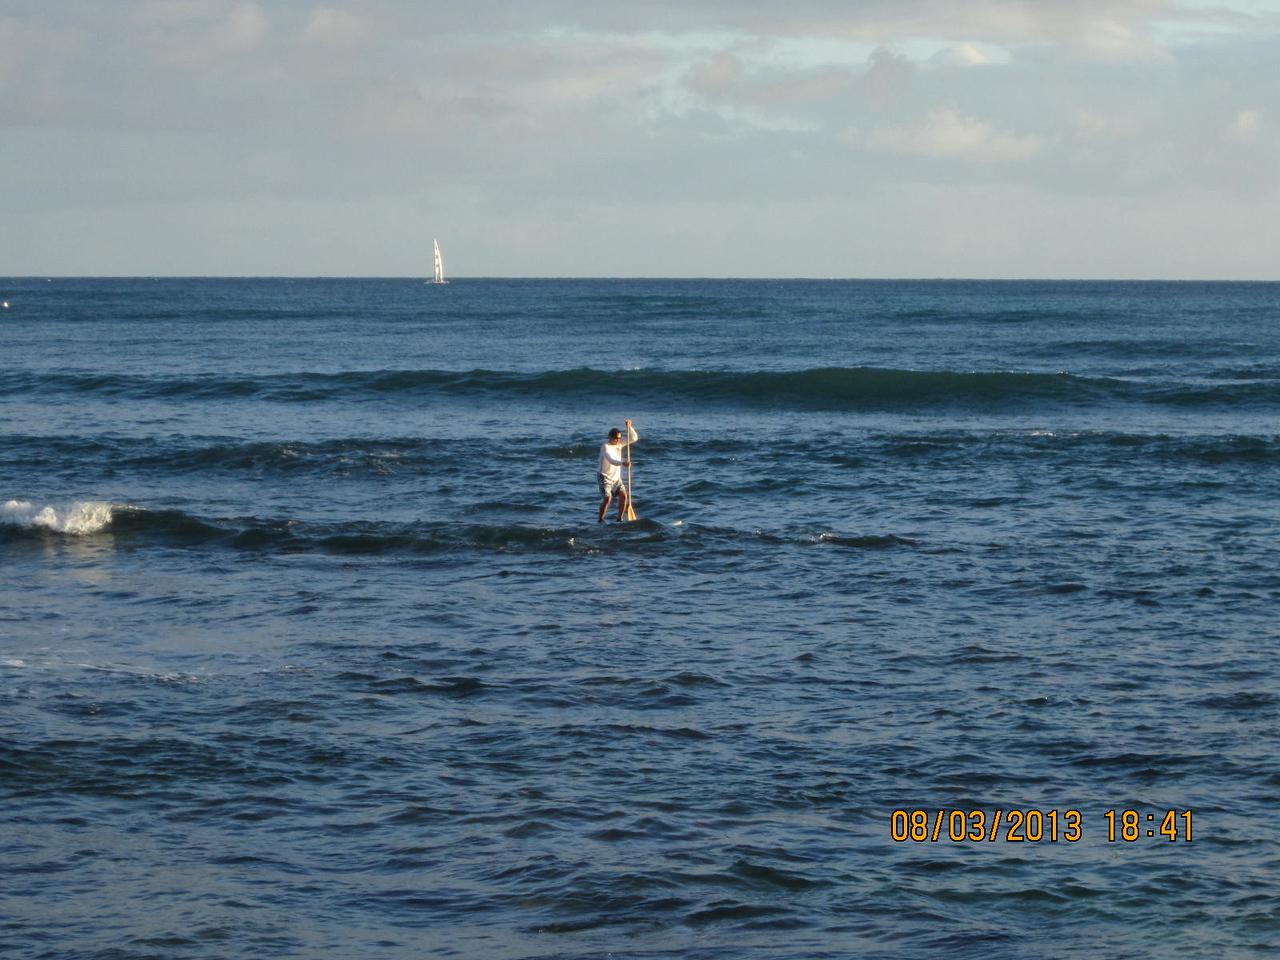 paddling on the ocean